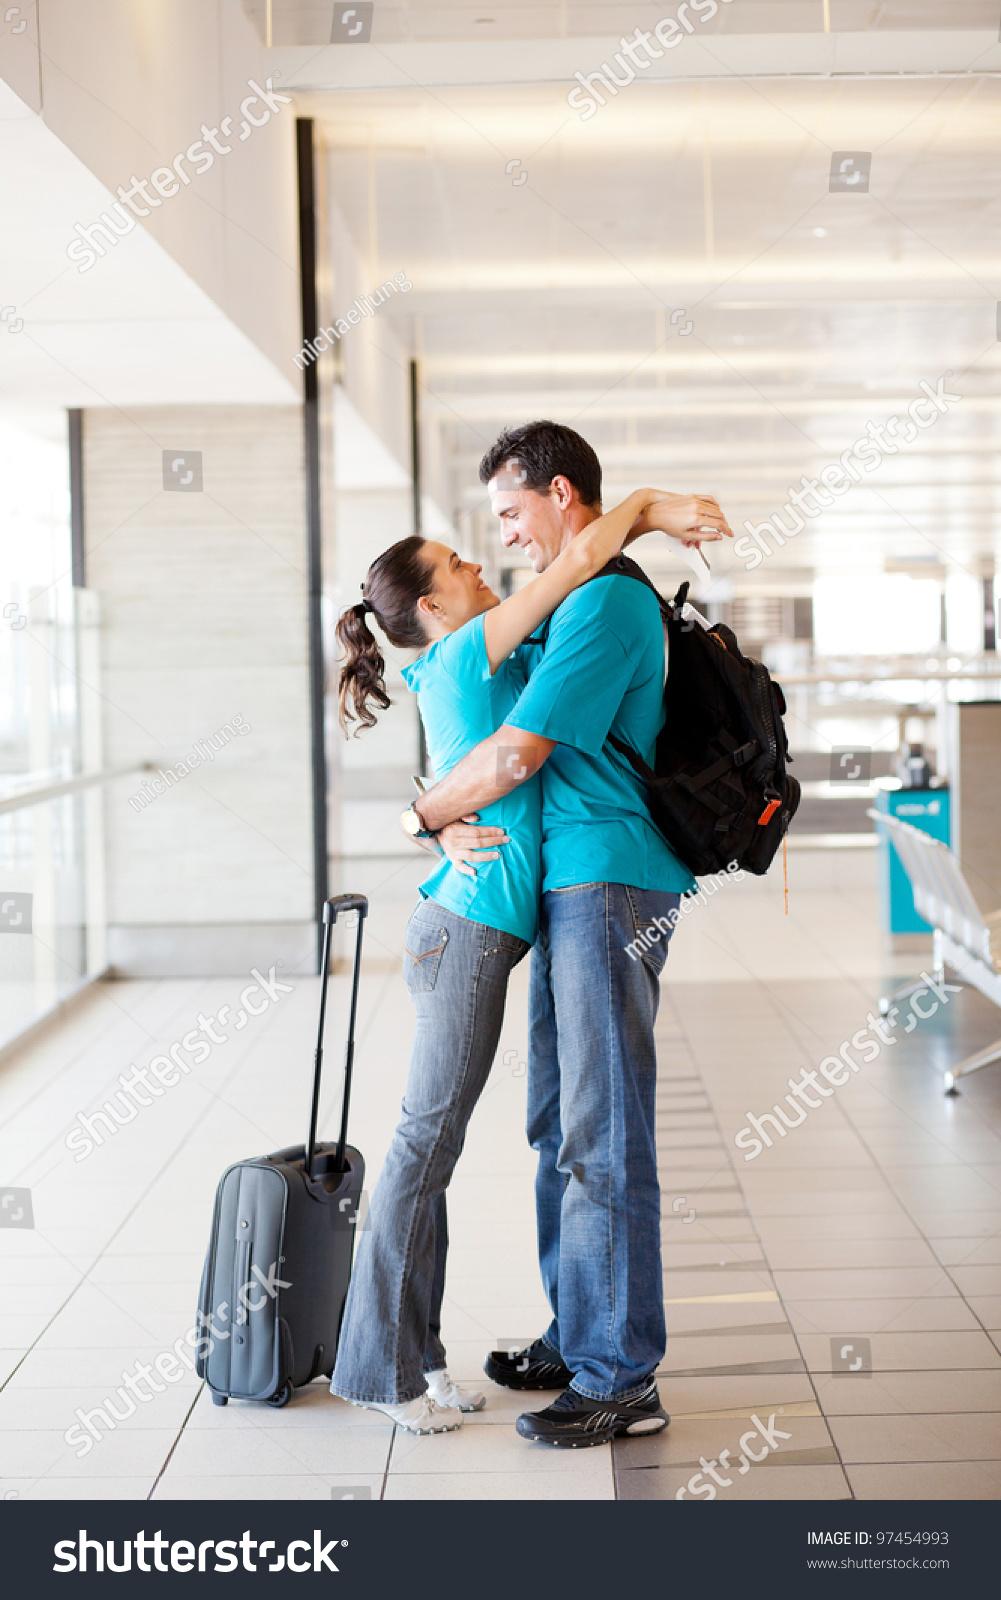 Секс в аеропорте фото 19 фотография